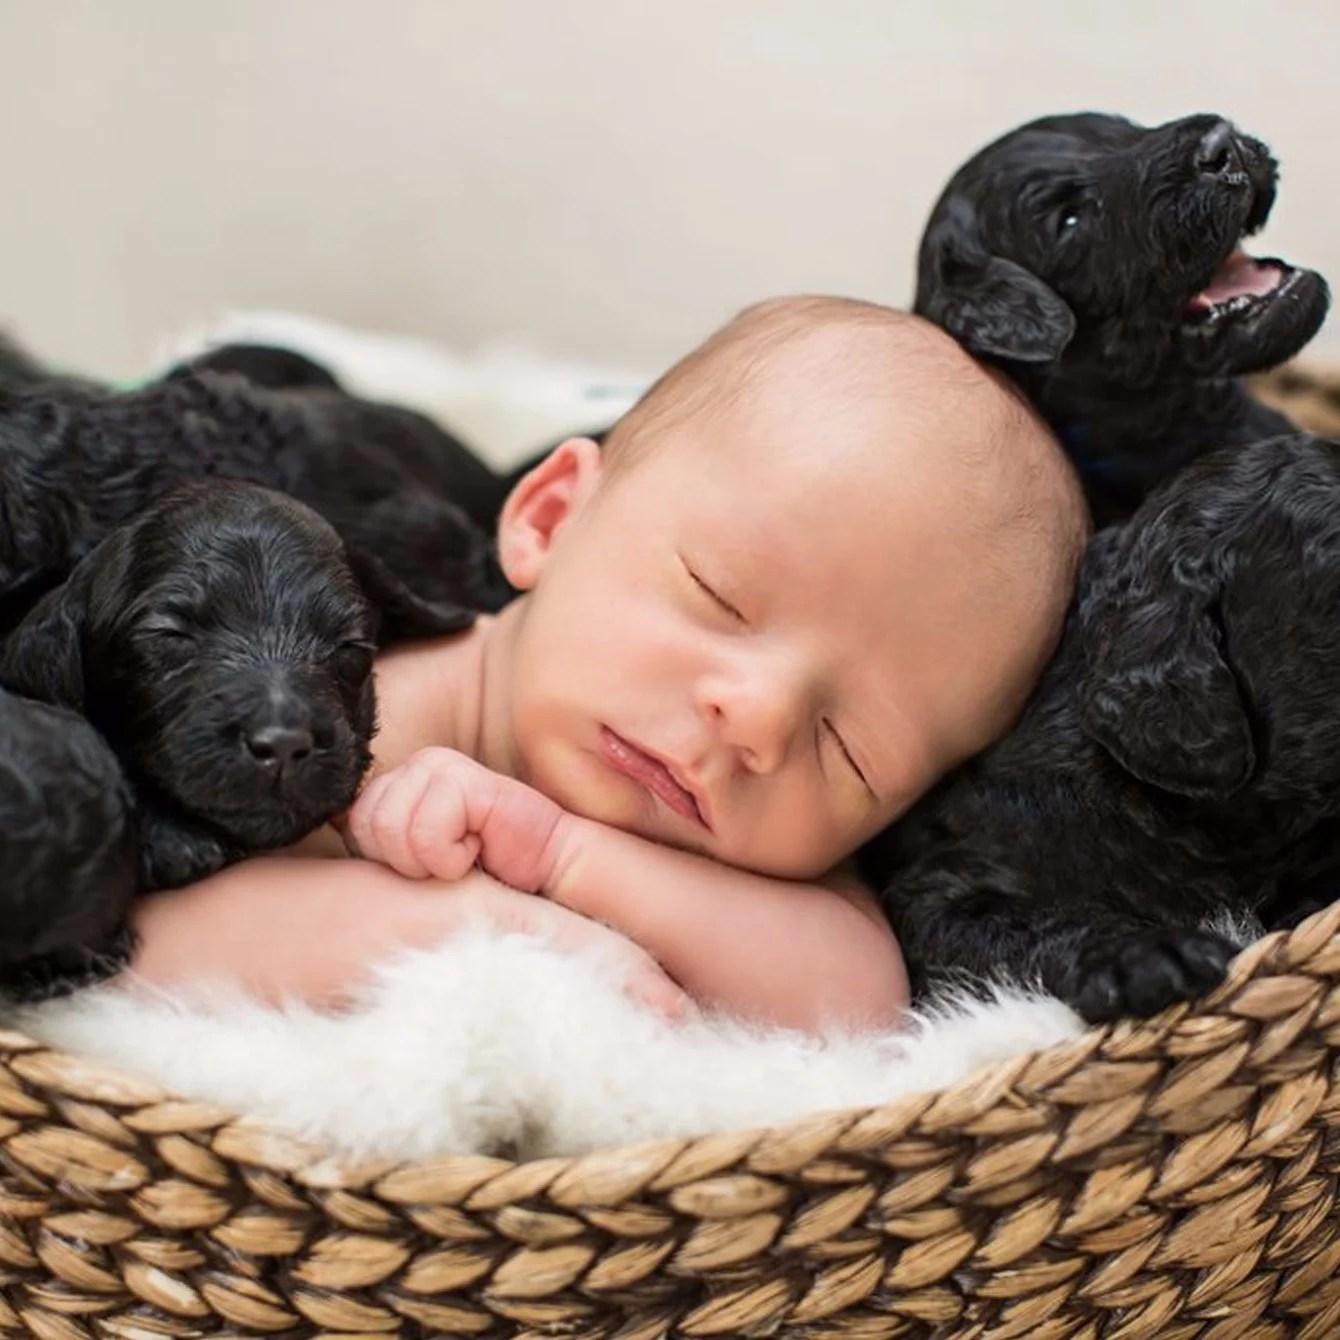 Newborn Baby And Puppies Photo Shoot Popsugar Family